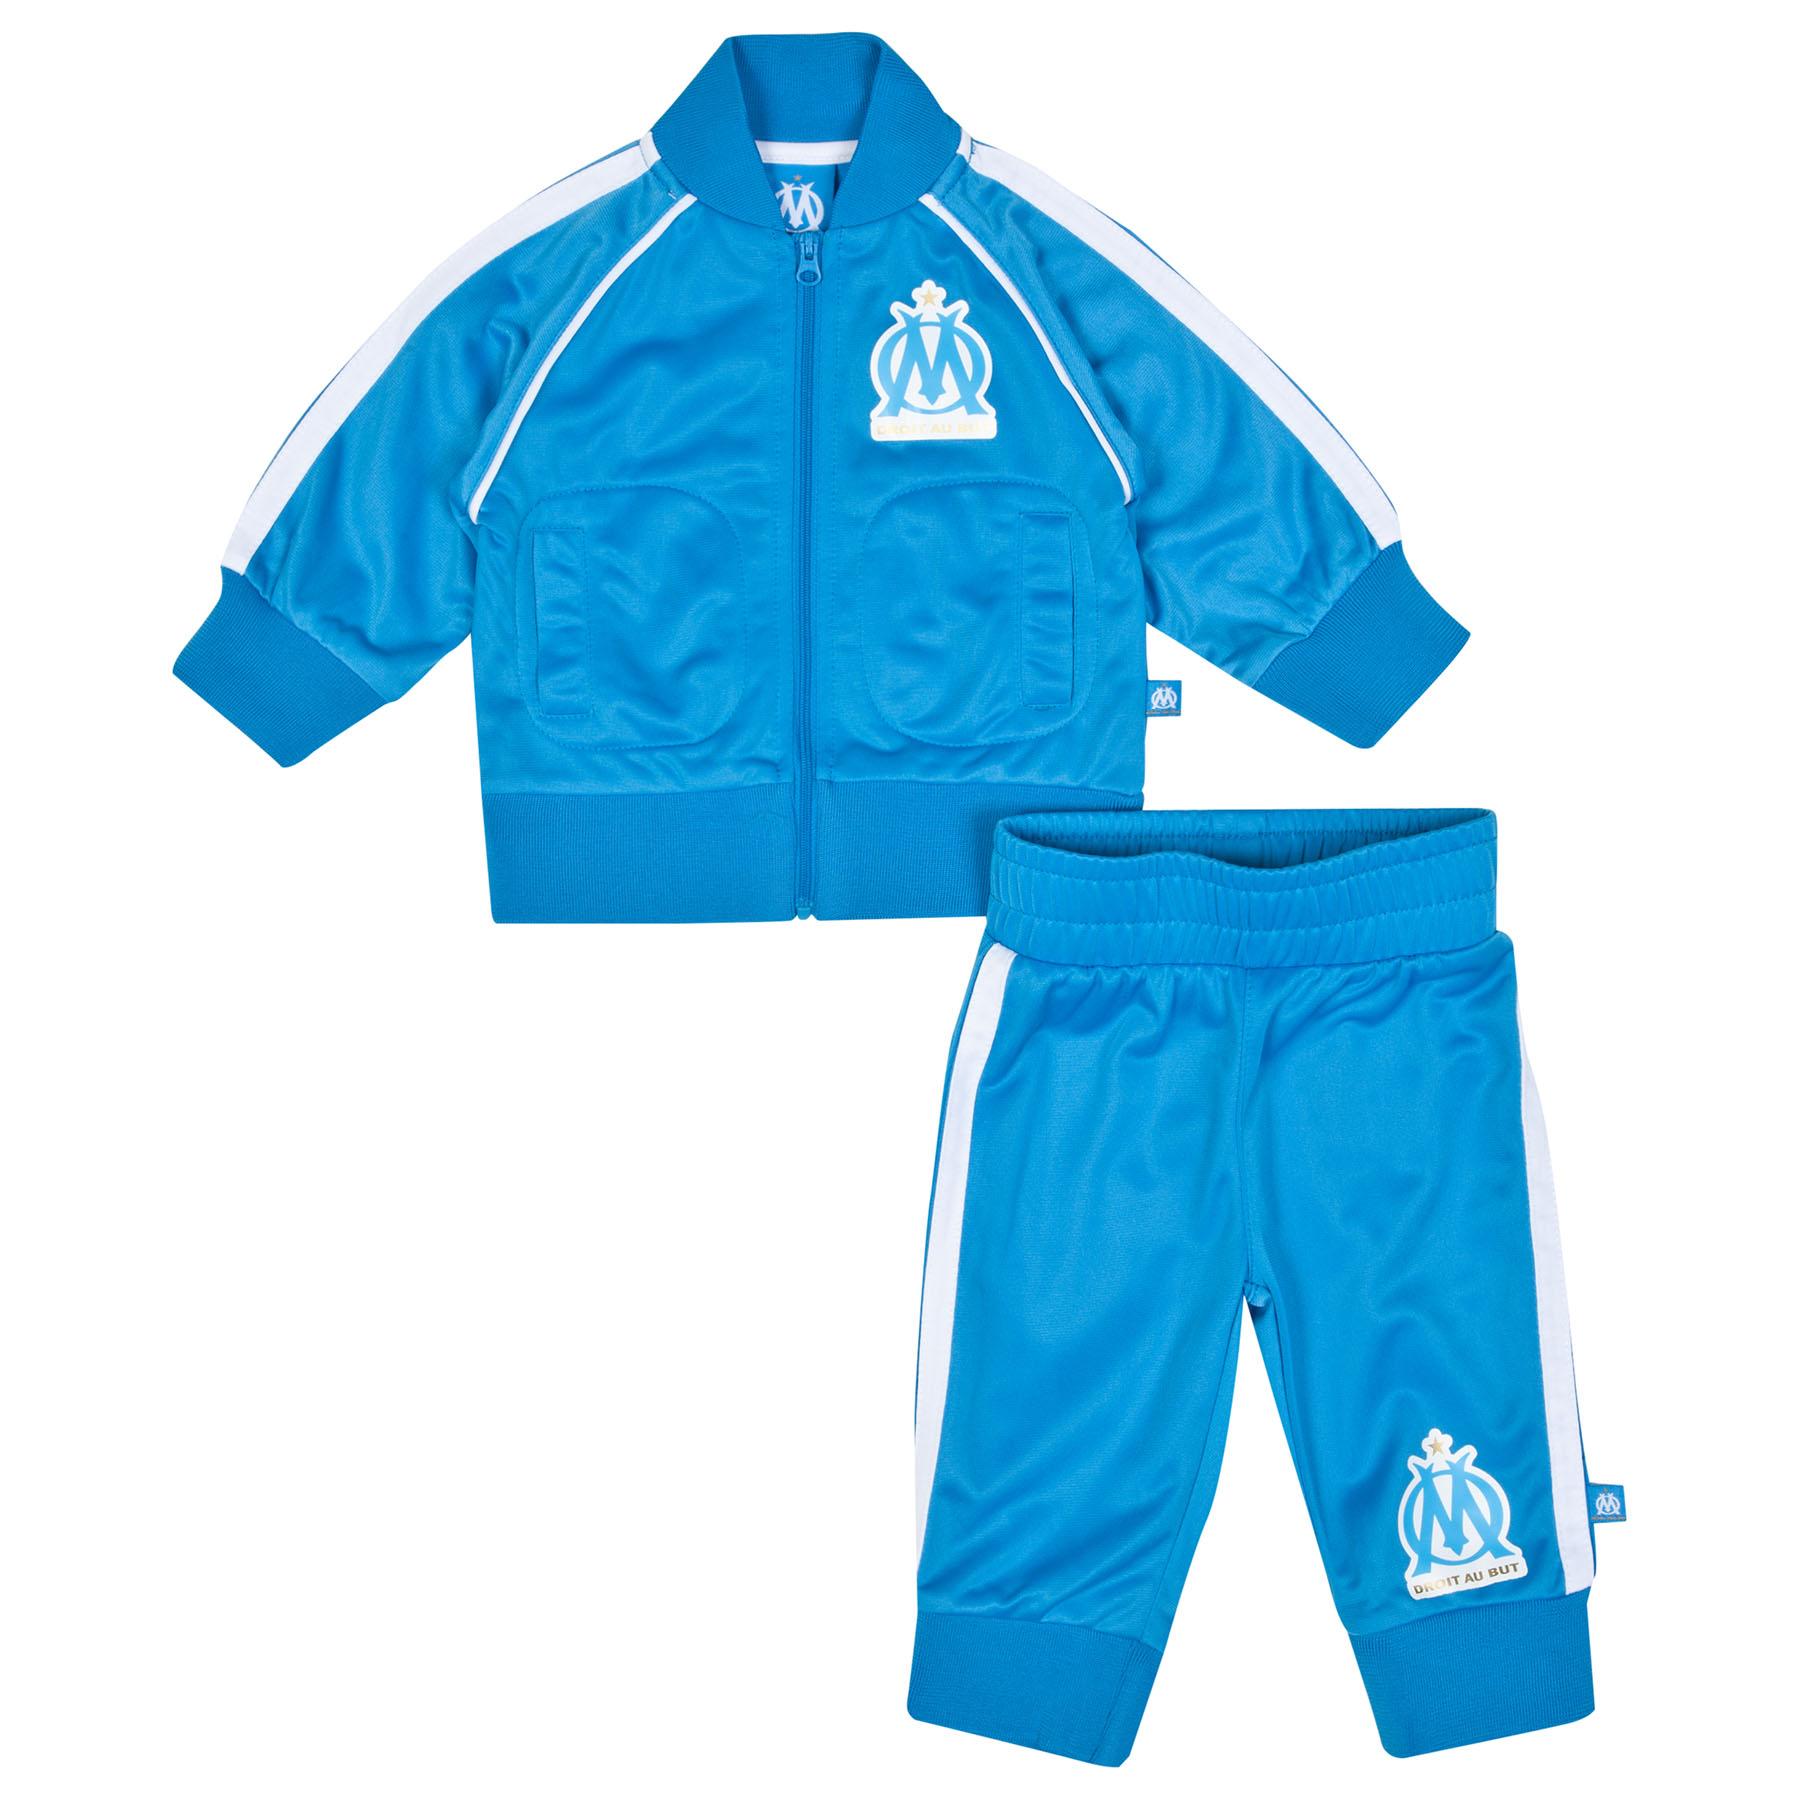 Olympique de Marseille Tracksuit - Blue - Baby Boys